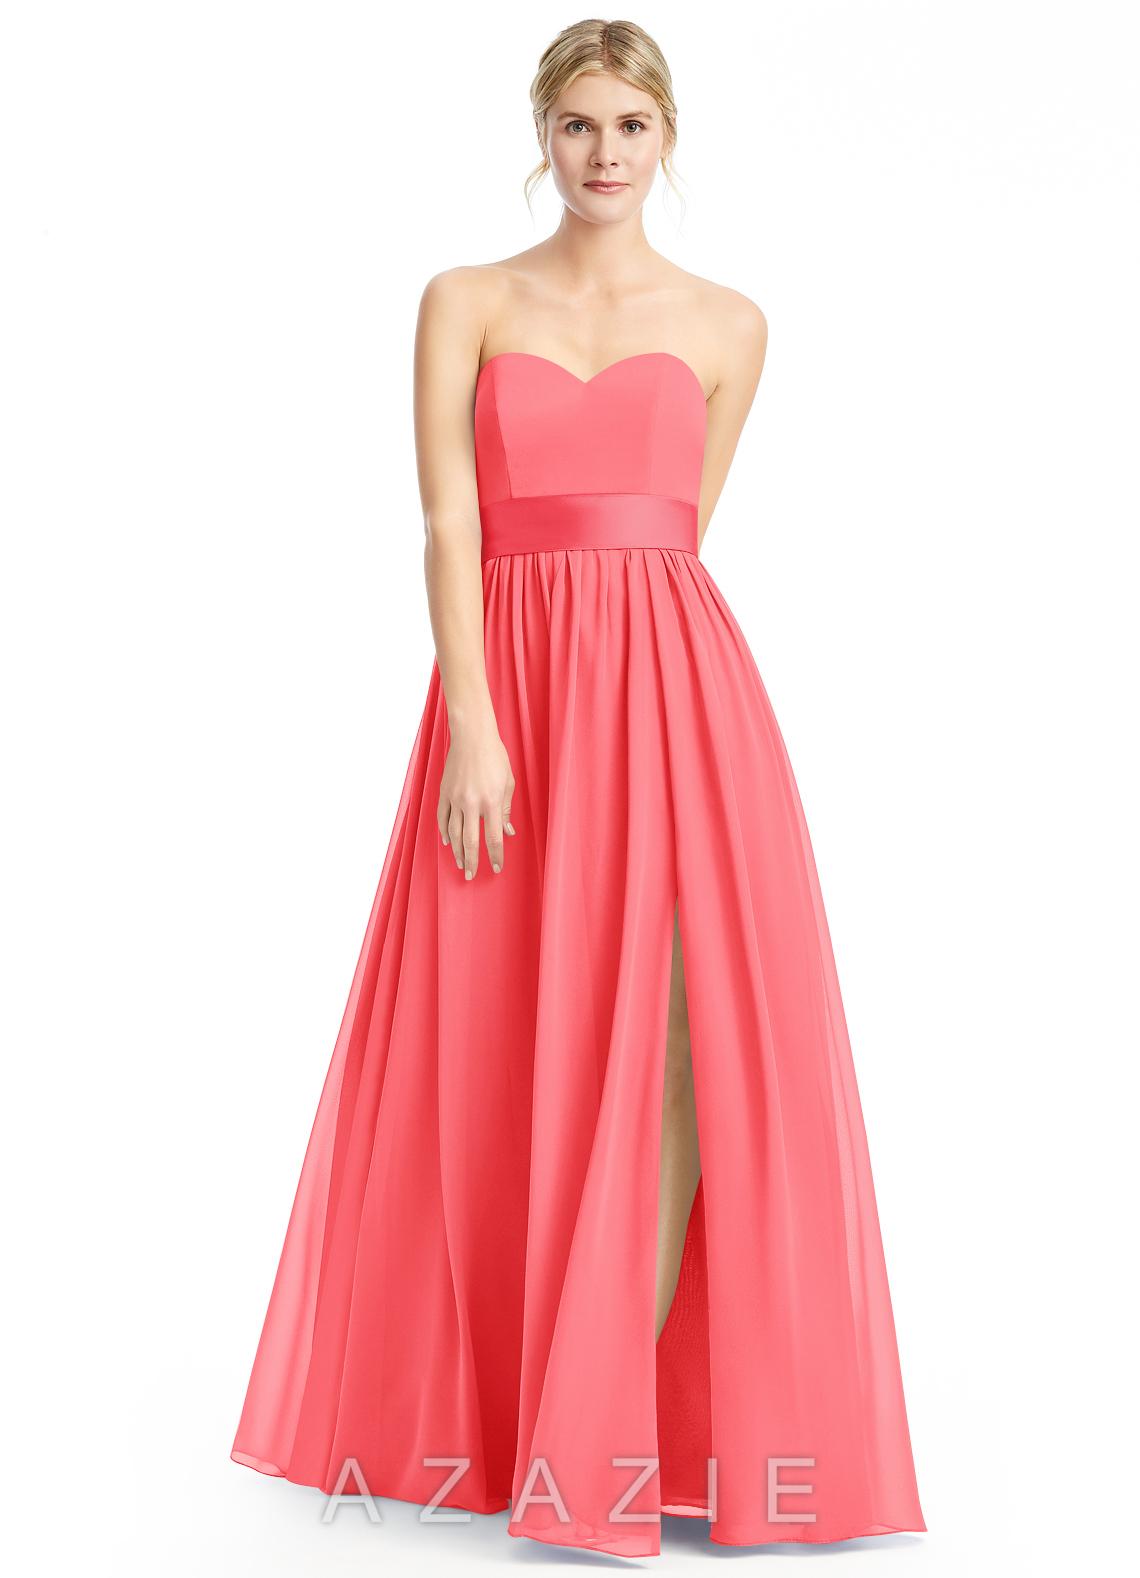 Azazie fiona bridesmaid dress azazie color watermelon ombrellifo Image collections